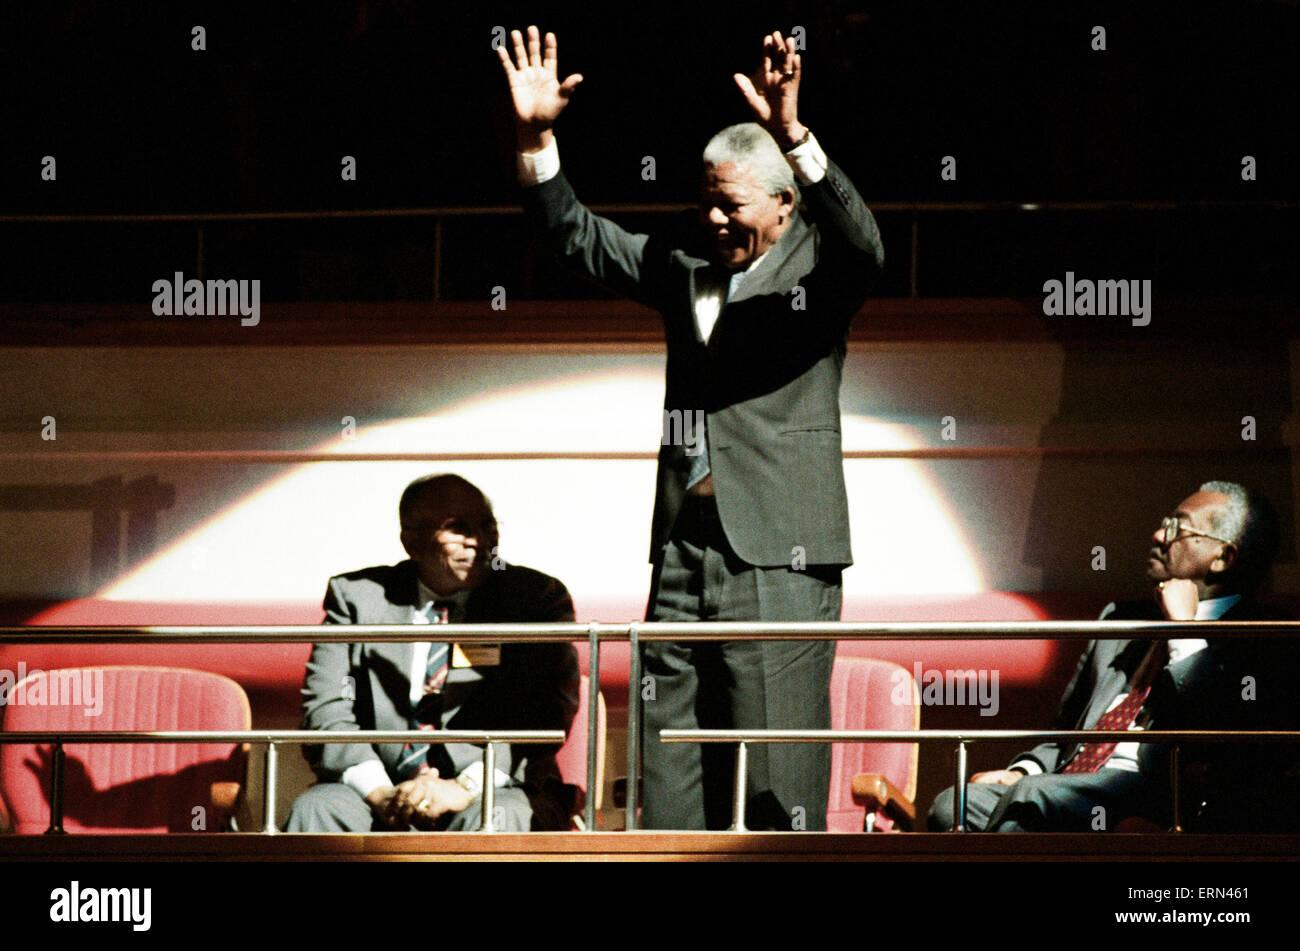 Nelson Mandela speaks at ICC, Birmingham, 10th October 1993. - Stock Image